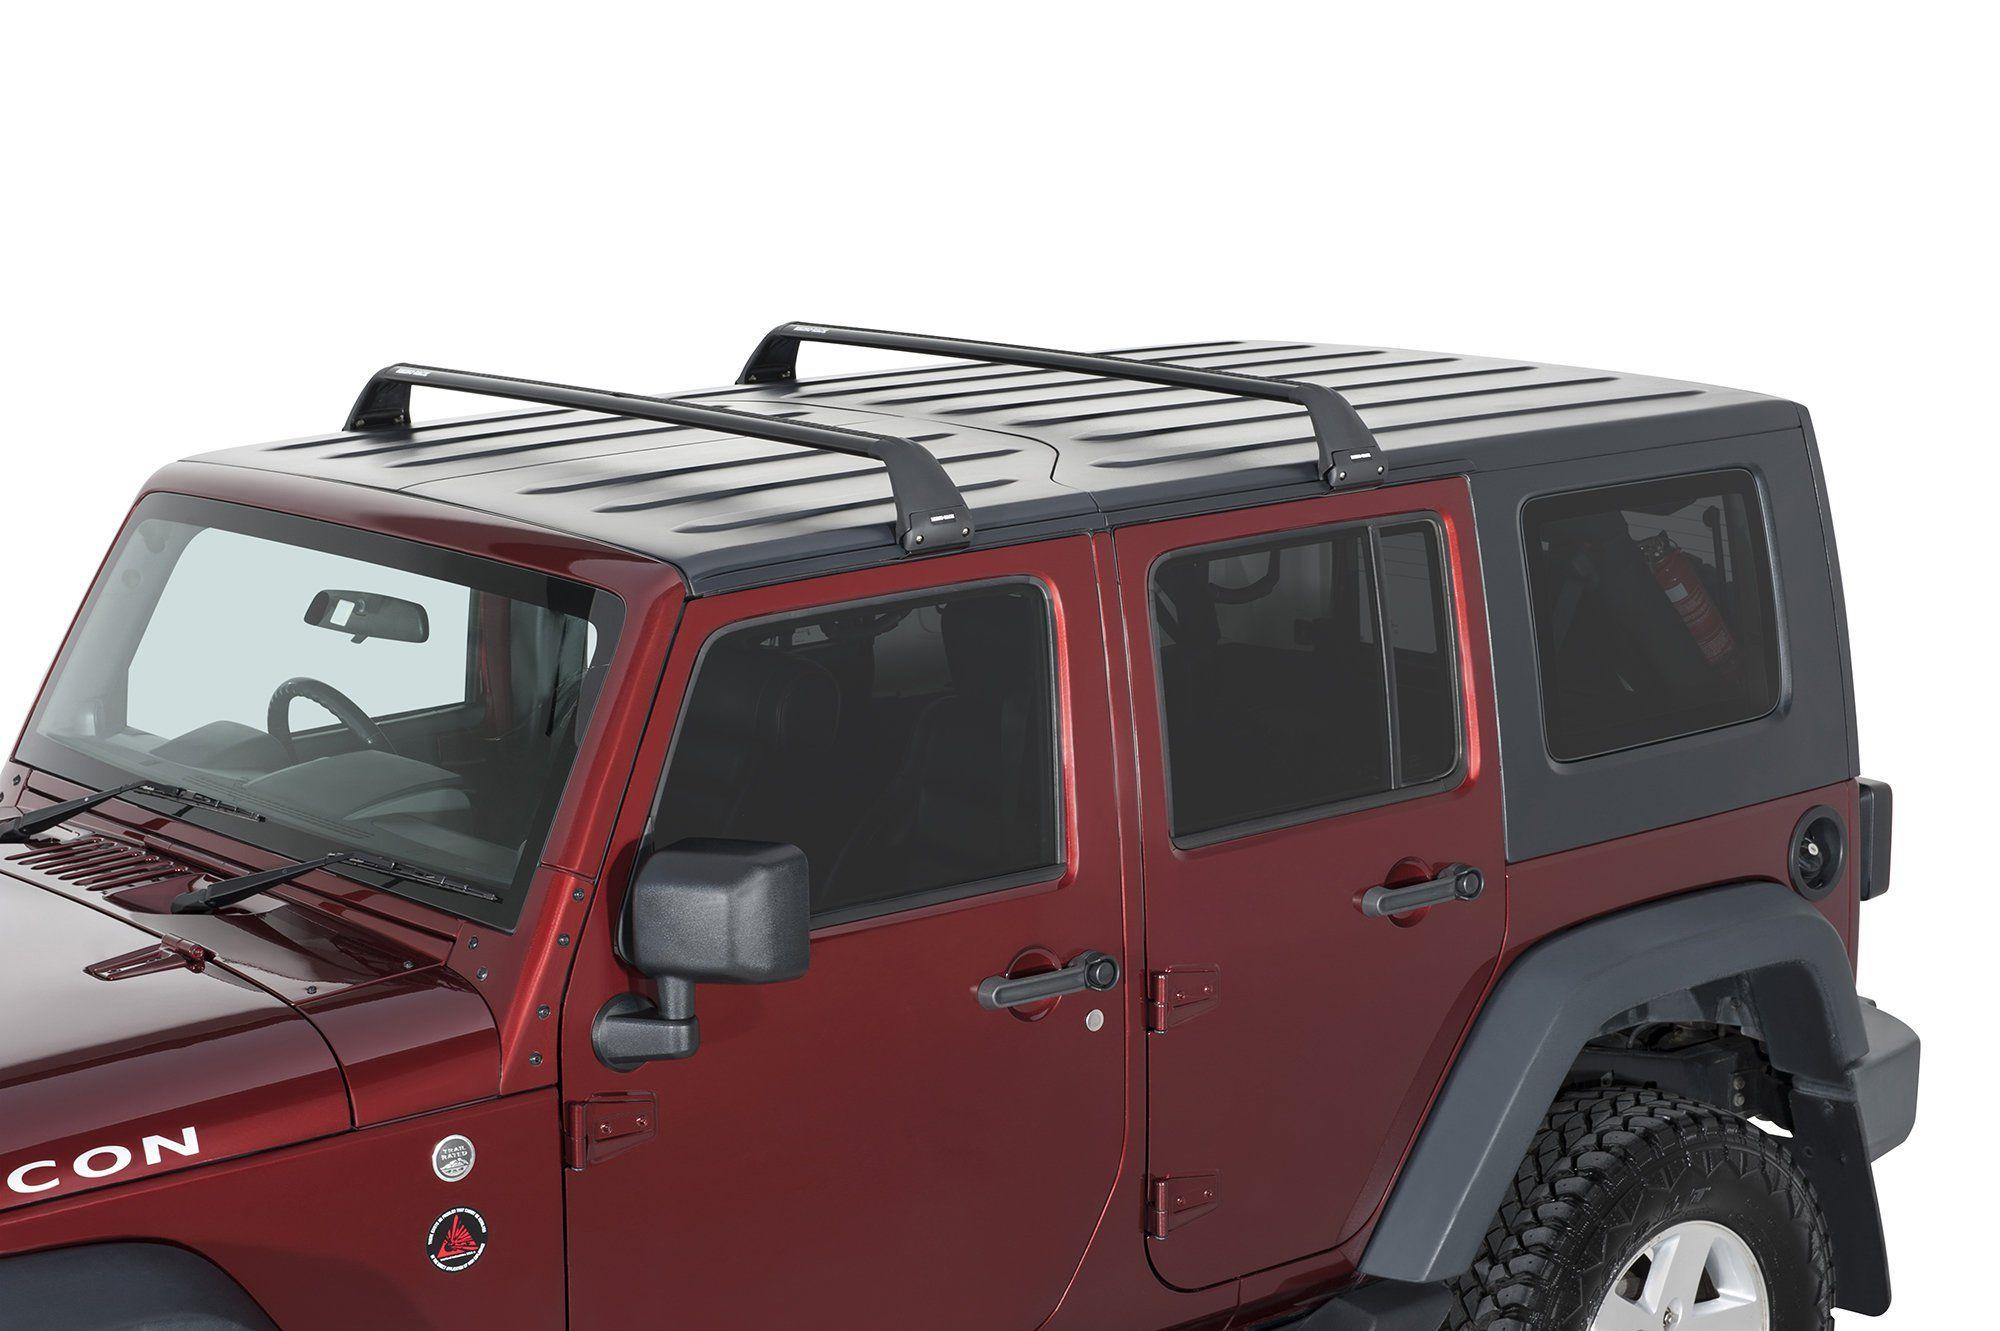 Rhino Rack Sg59 Gutter Mount Vortex 2 Bar Roof Rack For 07 20 Wrangler Jl Jk Unlimited